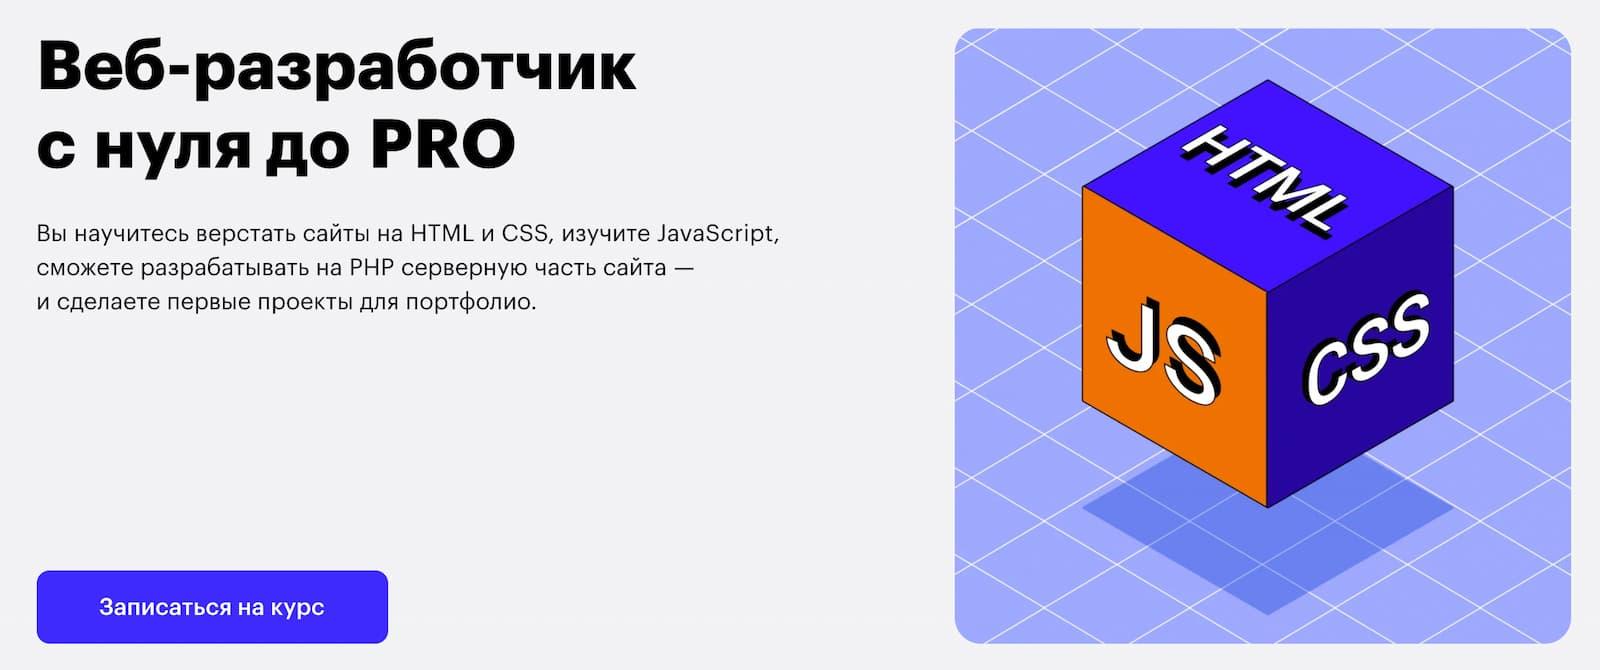 Записаться на курс «Веб-разработчик с нуля до PRO» от Skillbox